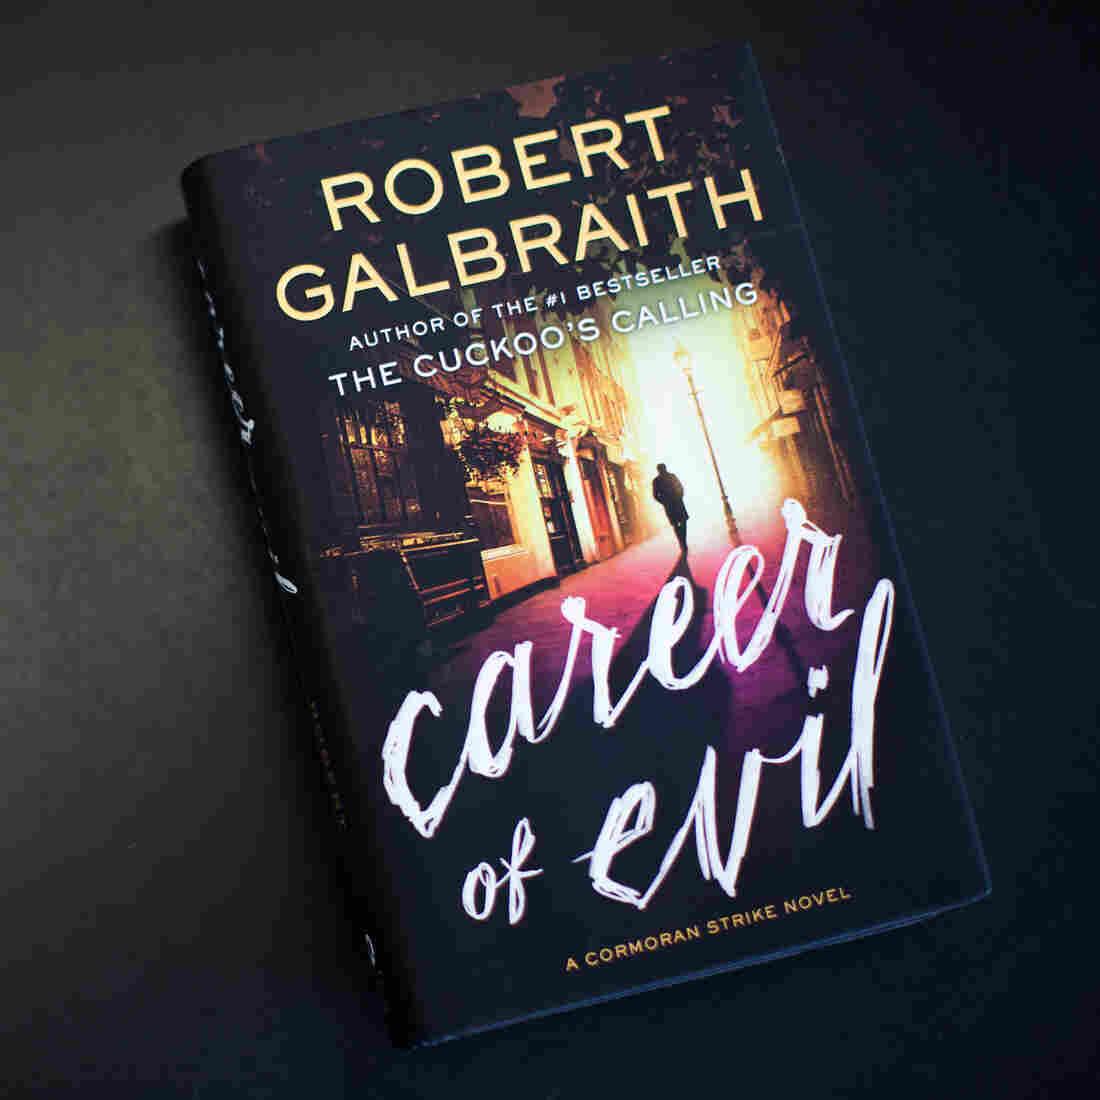 Career of Evil, by Robert Galbraith (aka J.K. Rowling).